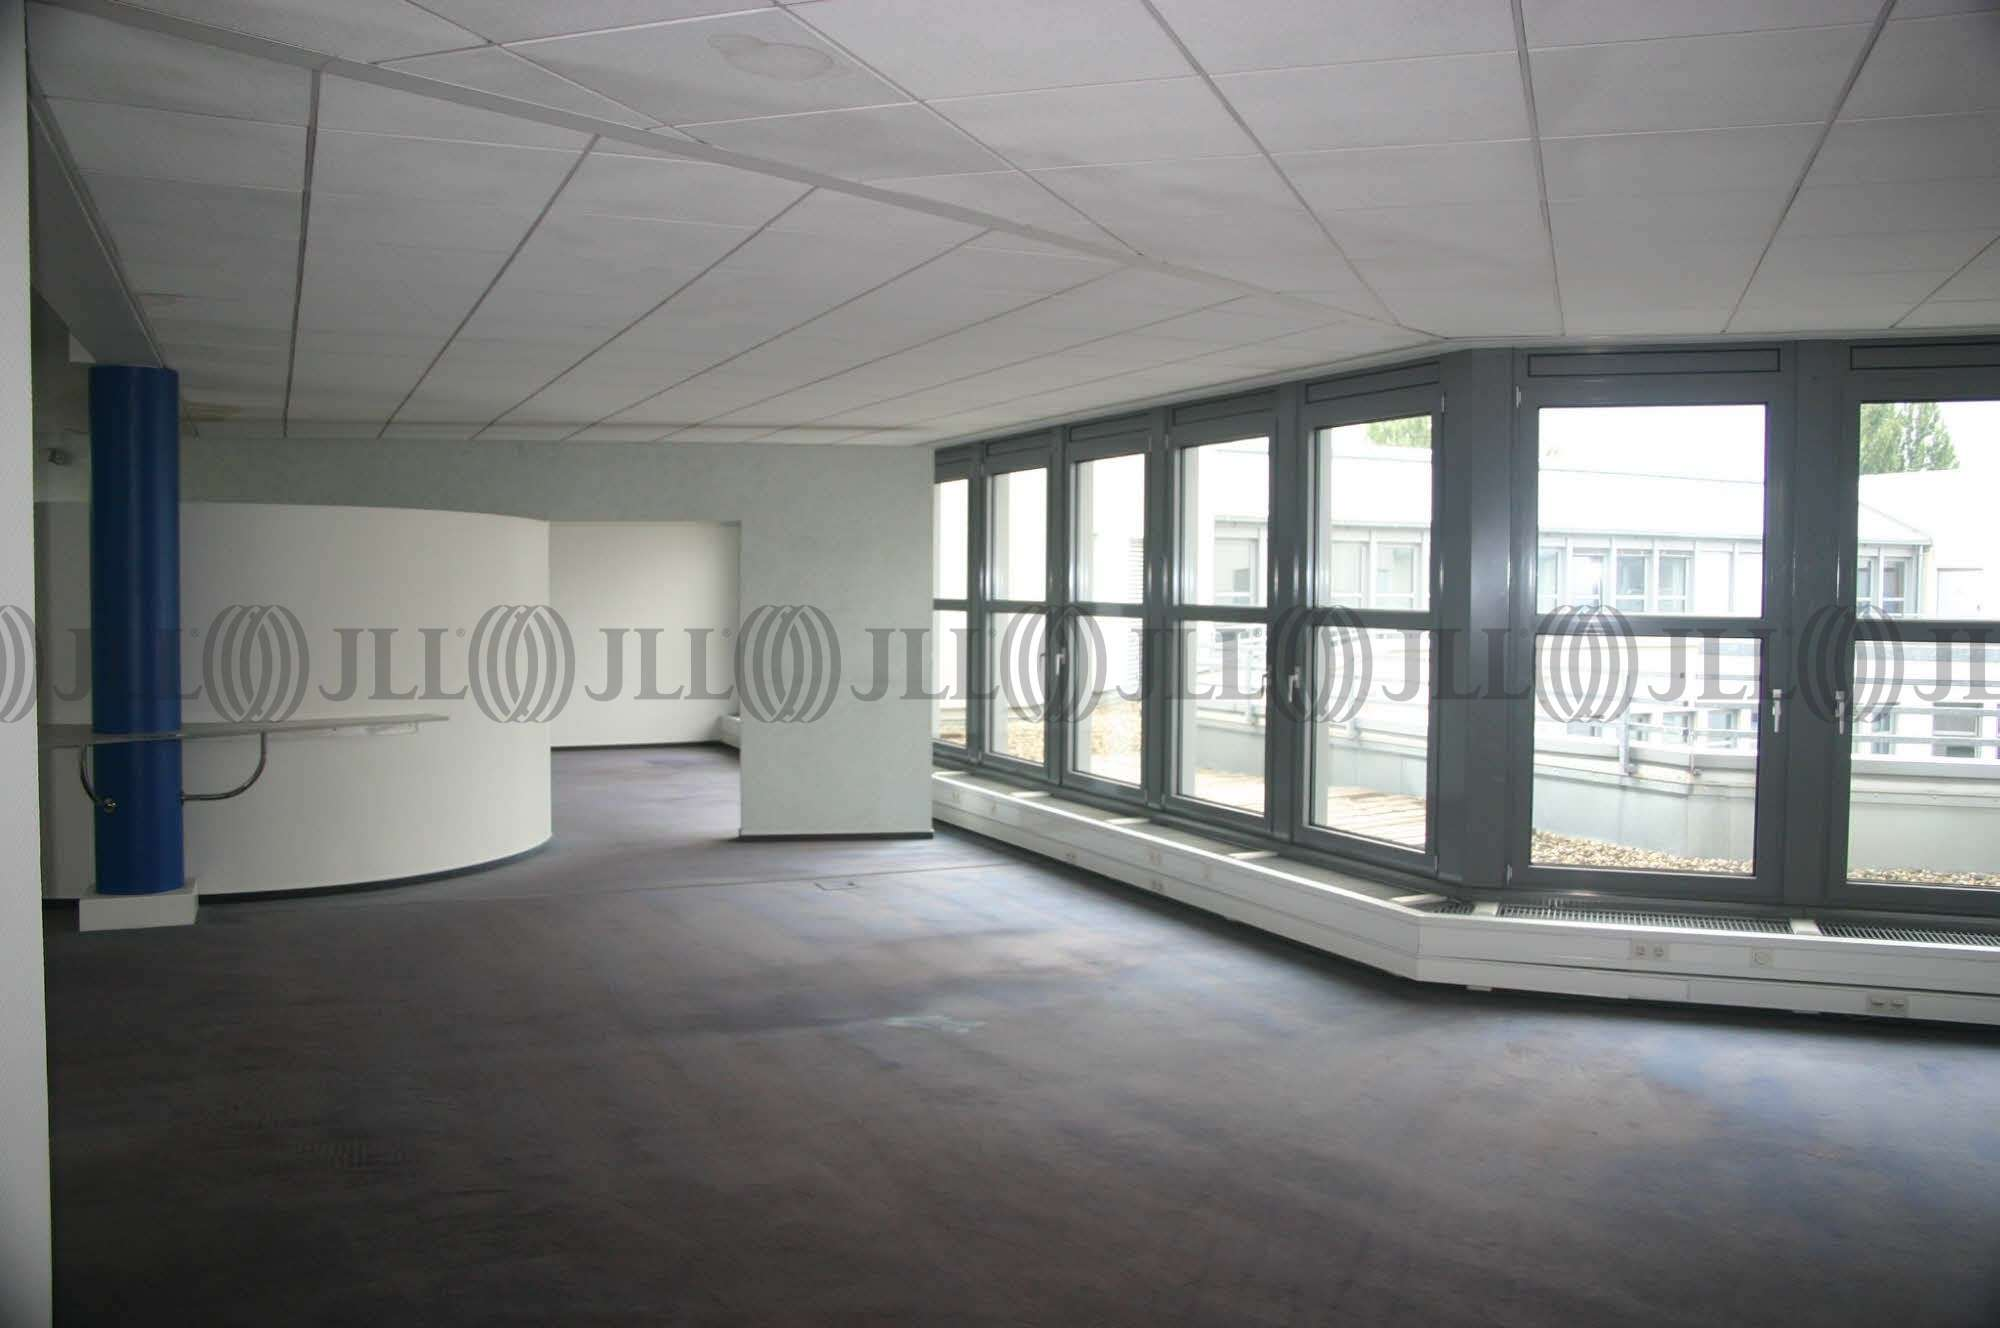 Büros Leinfelden-echterdingen, 70771 - Büro - Leinfelden-Echterdingen, Echterdingen - S0005 - 9406732